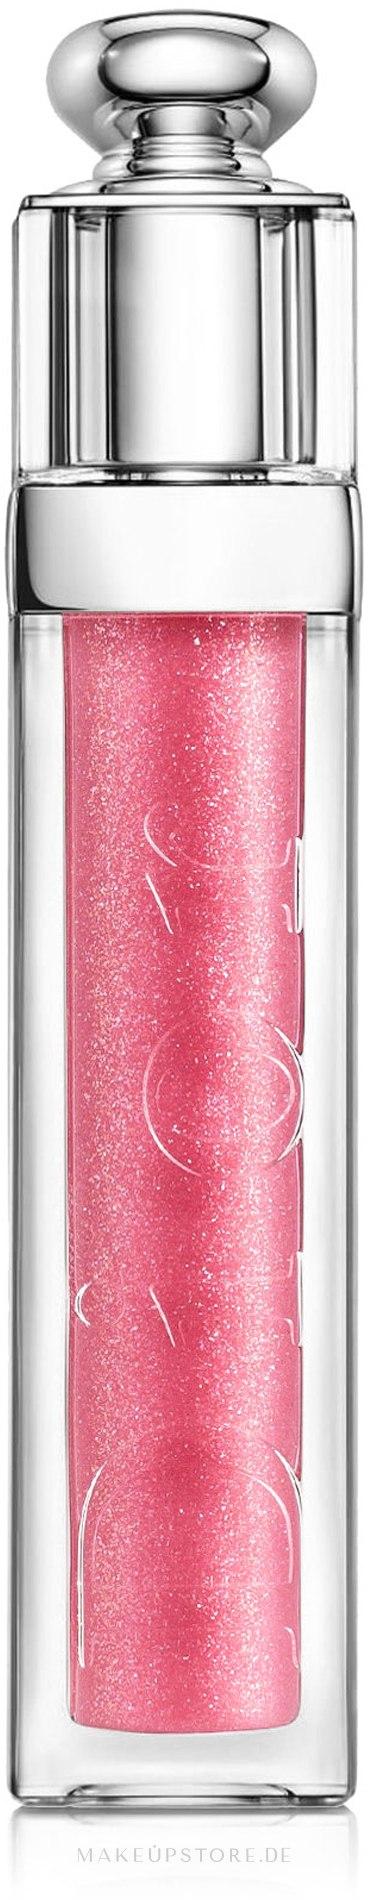 Lipgloss - Dior Addict Ultra Gloss — Bild 553 - Princess